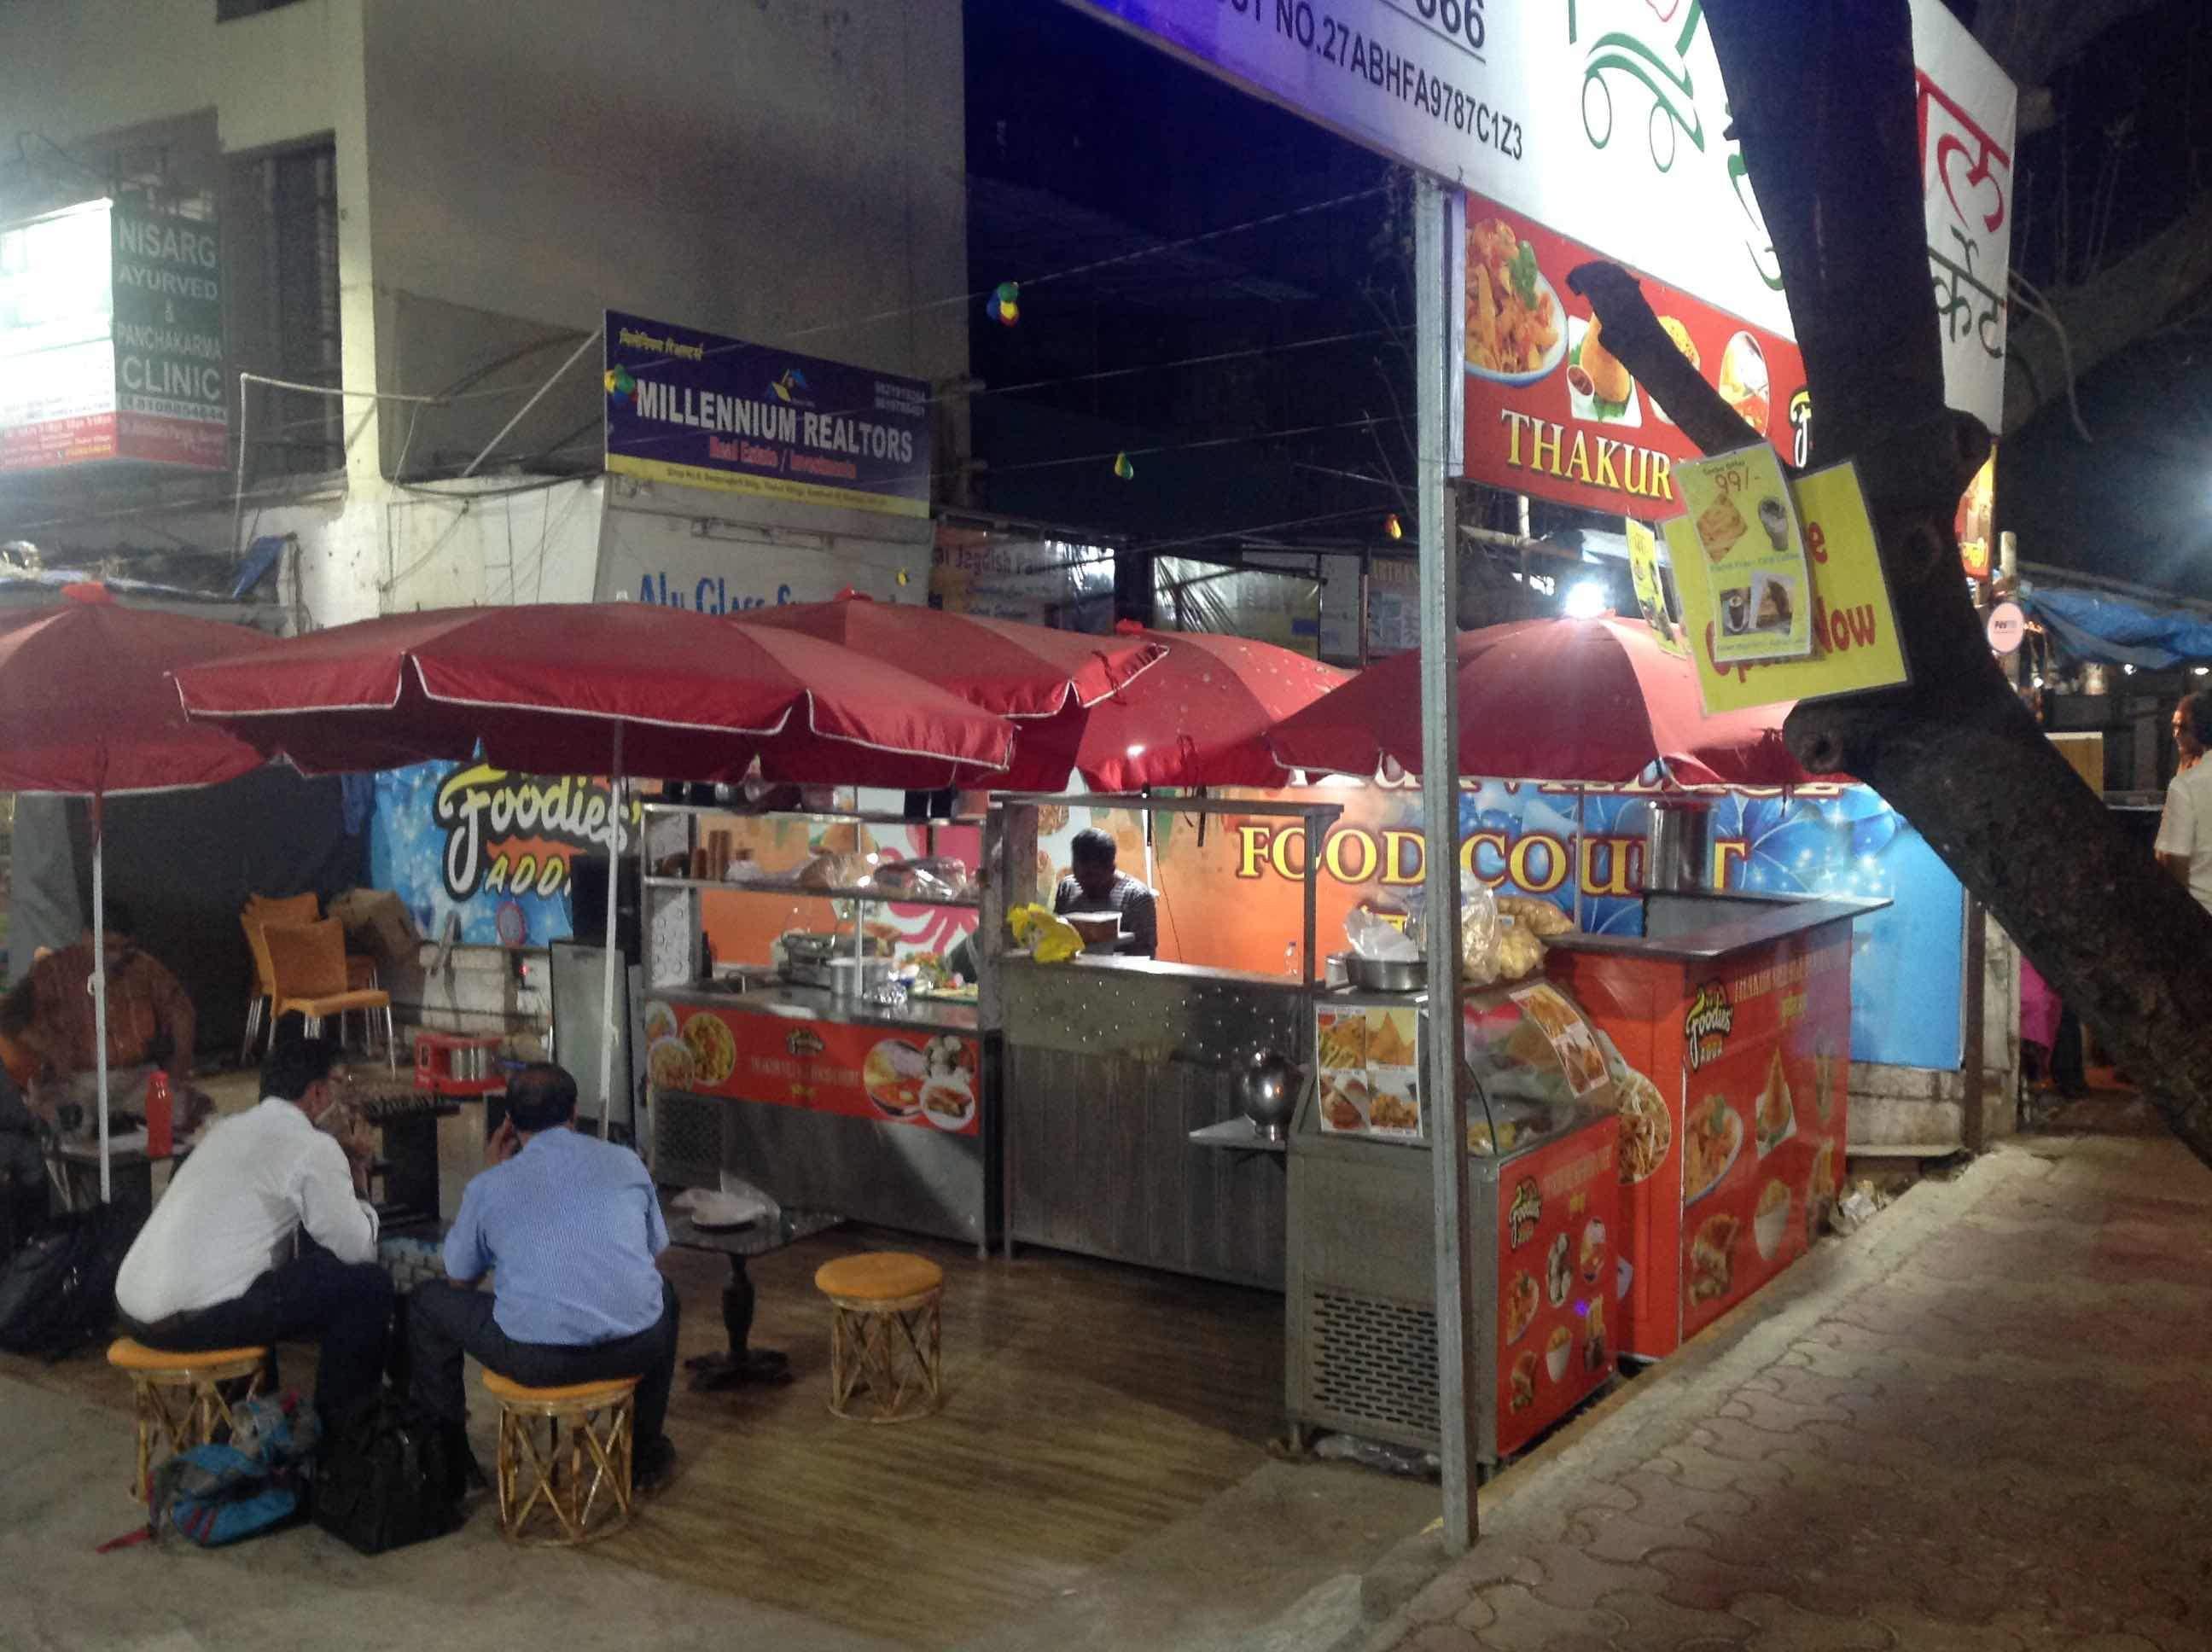 Foo s Adda Thakur Village Kandivali East Tiffin Services in Mumbai Justdial